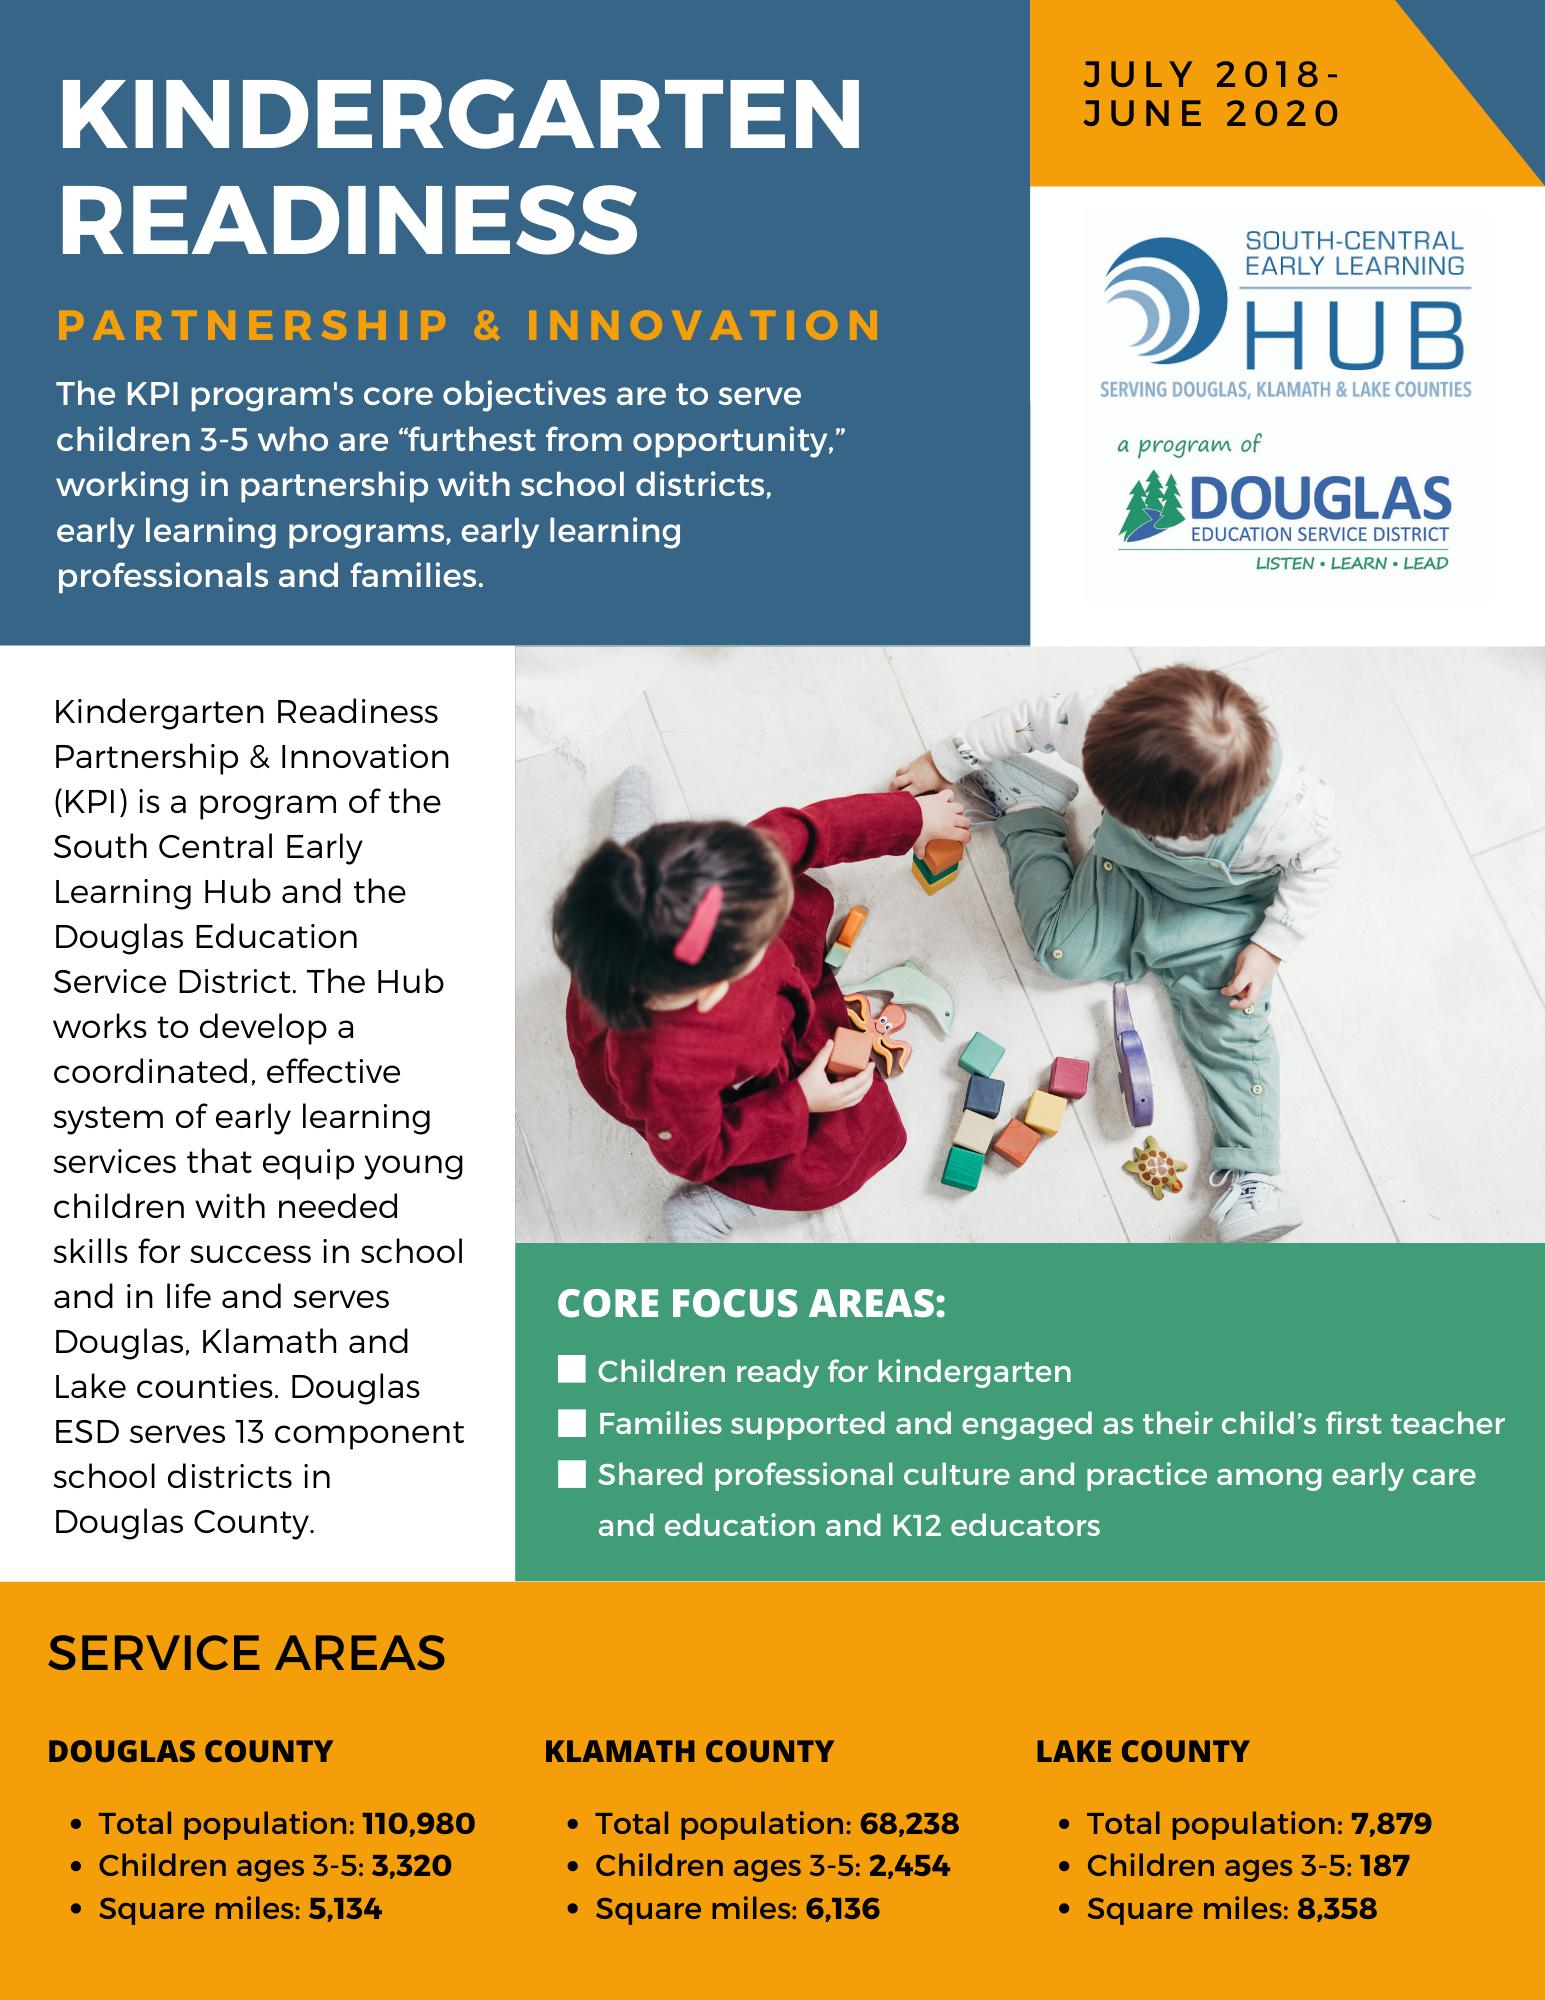 Kindergarten Readiness Partnership and Innovation report